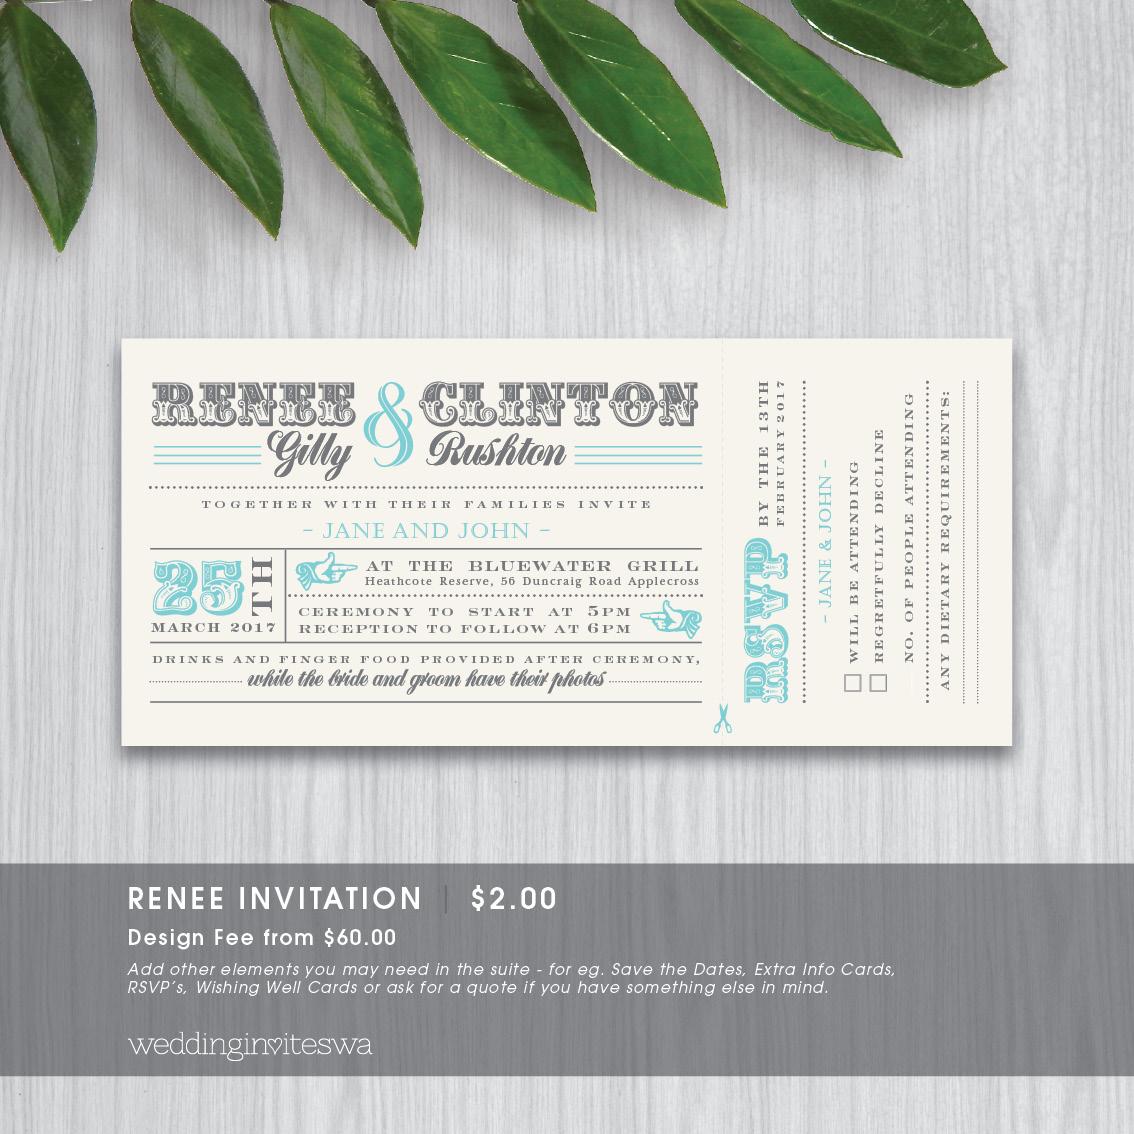 RENEE_invite